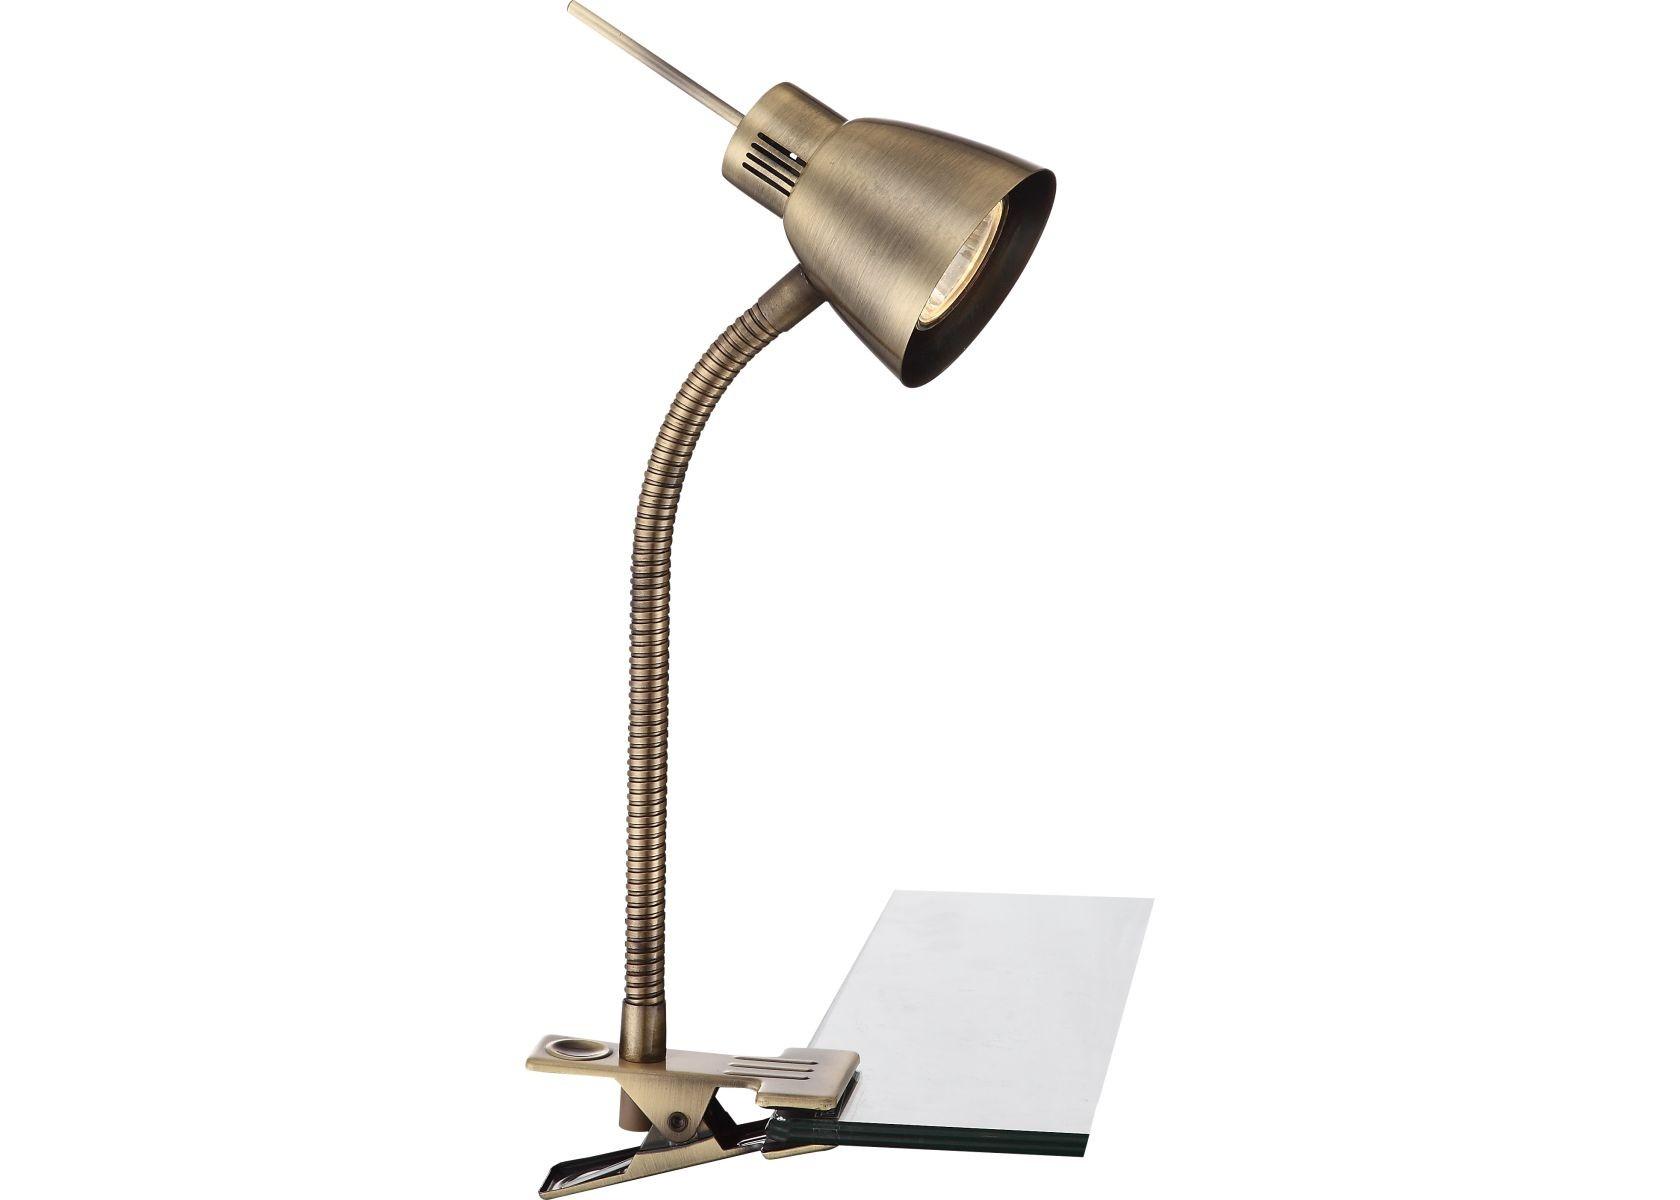 Настольная лампаНастольные лампы<br>&amp;lt;div&amp;gt;Вид цоколя: G10&amp;lt;/div&amp;gt;&amp;lt;div&amp;gt;Мощность: 35W&amp;lt;/div&amp;gt;&amp;lt;div&amp;gt;Количество ламп: 1&amp;lt;/div&amp;gt;<br><br>Material: Металл<br>Высота см: 37